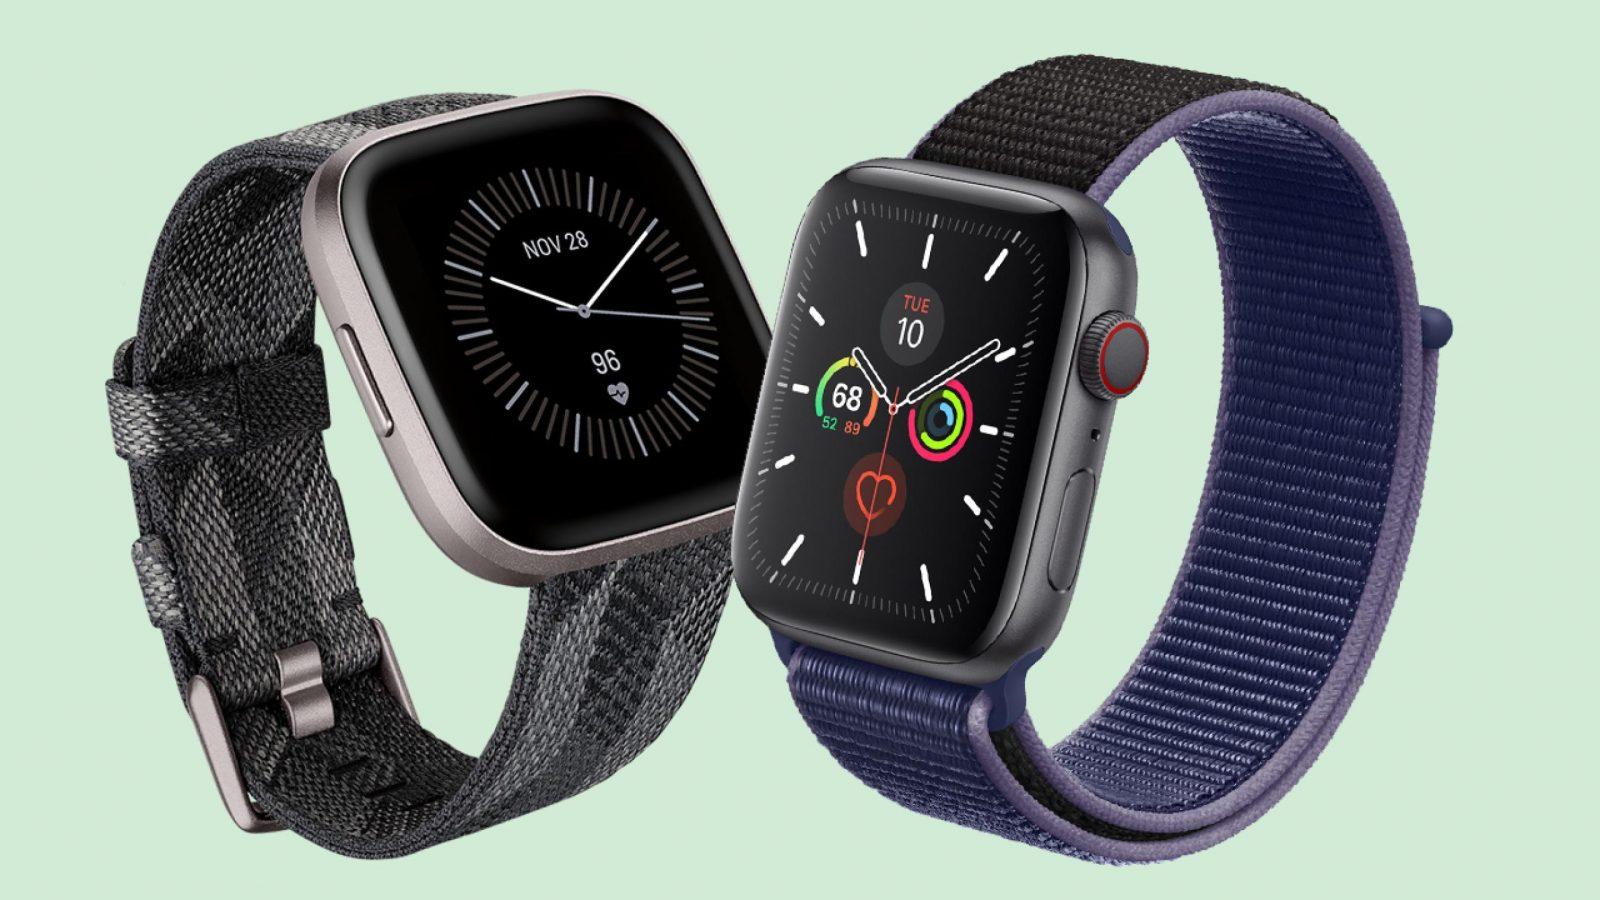 Apple Watch Series 5 VS Fitbit Versa 2